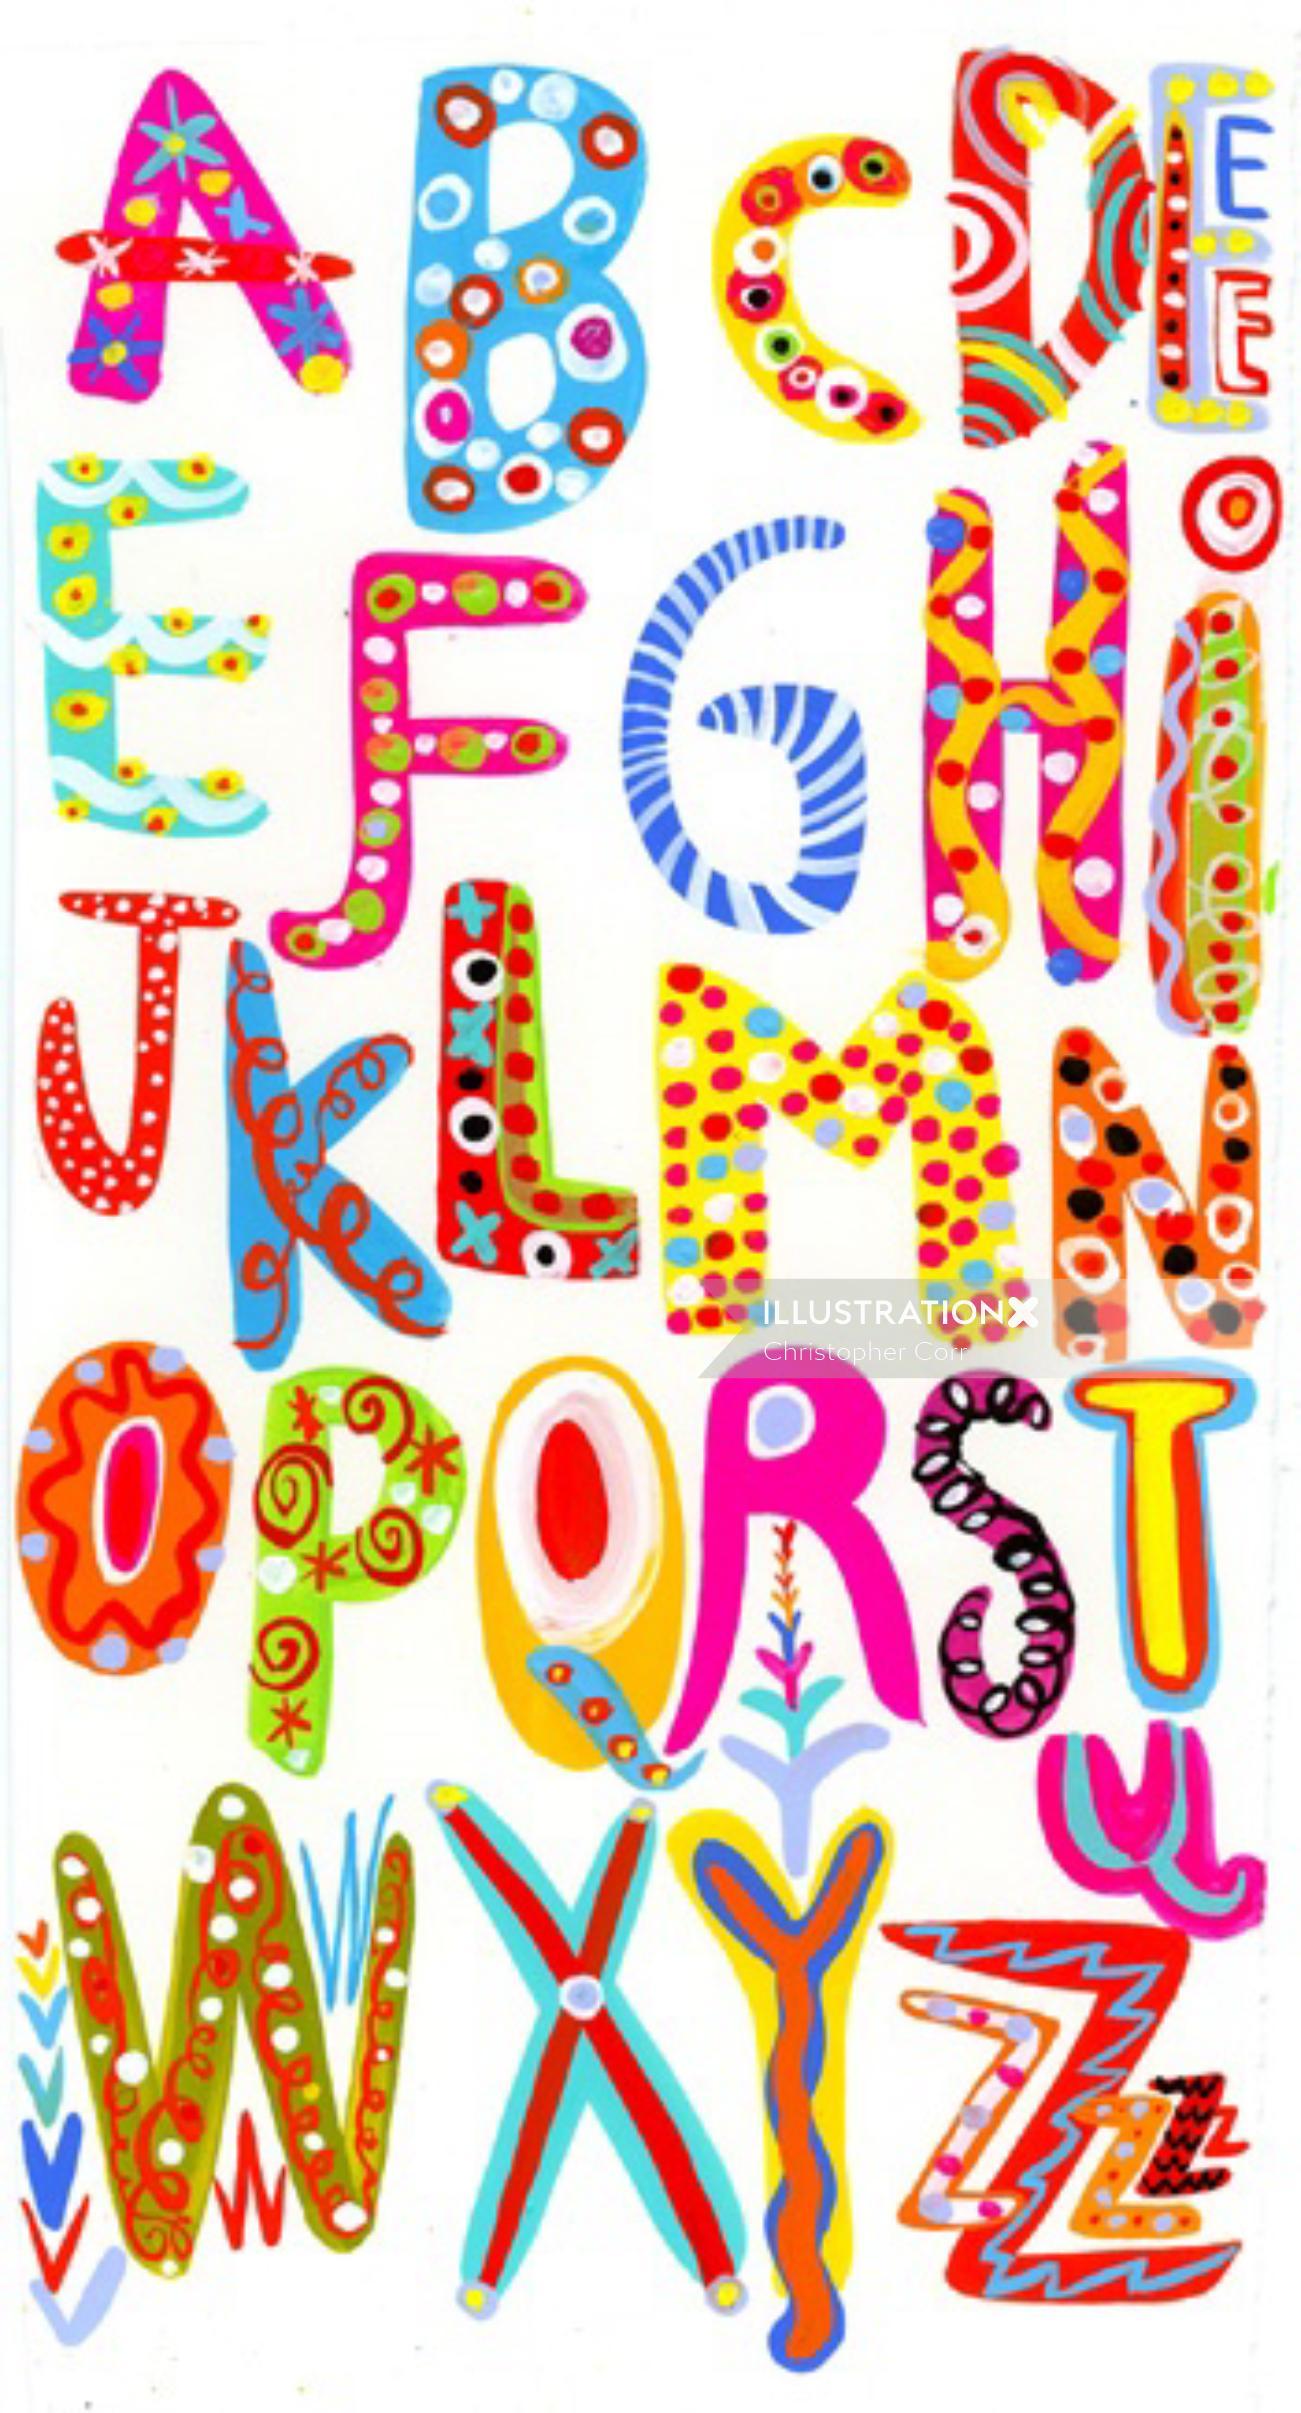 Alphabets illustration by Christopher Corr